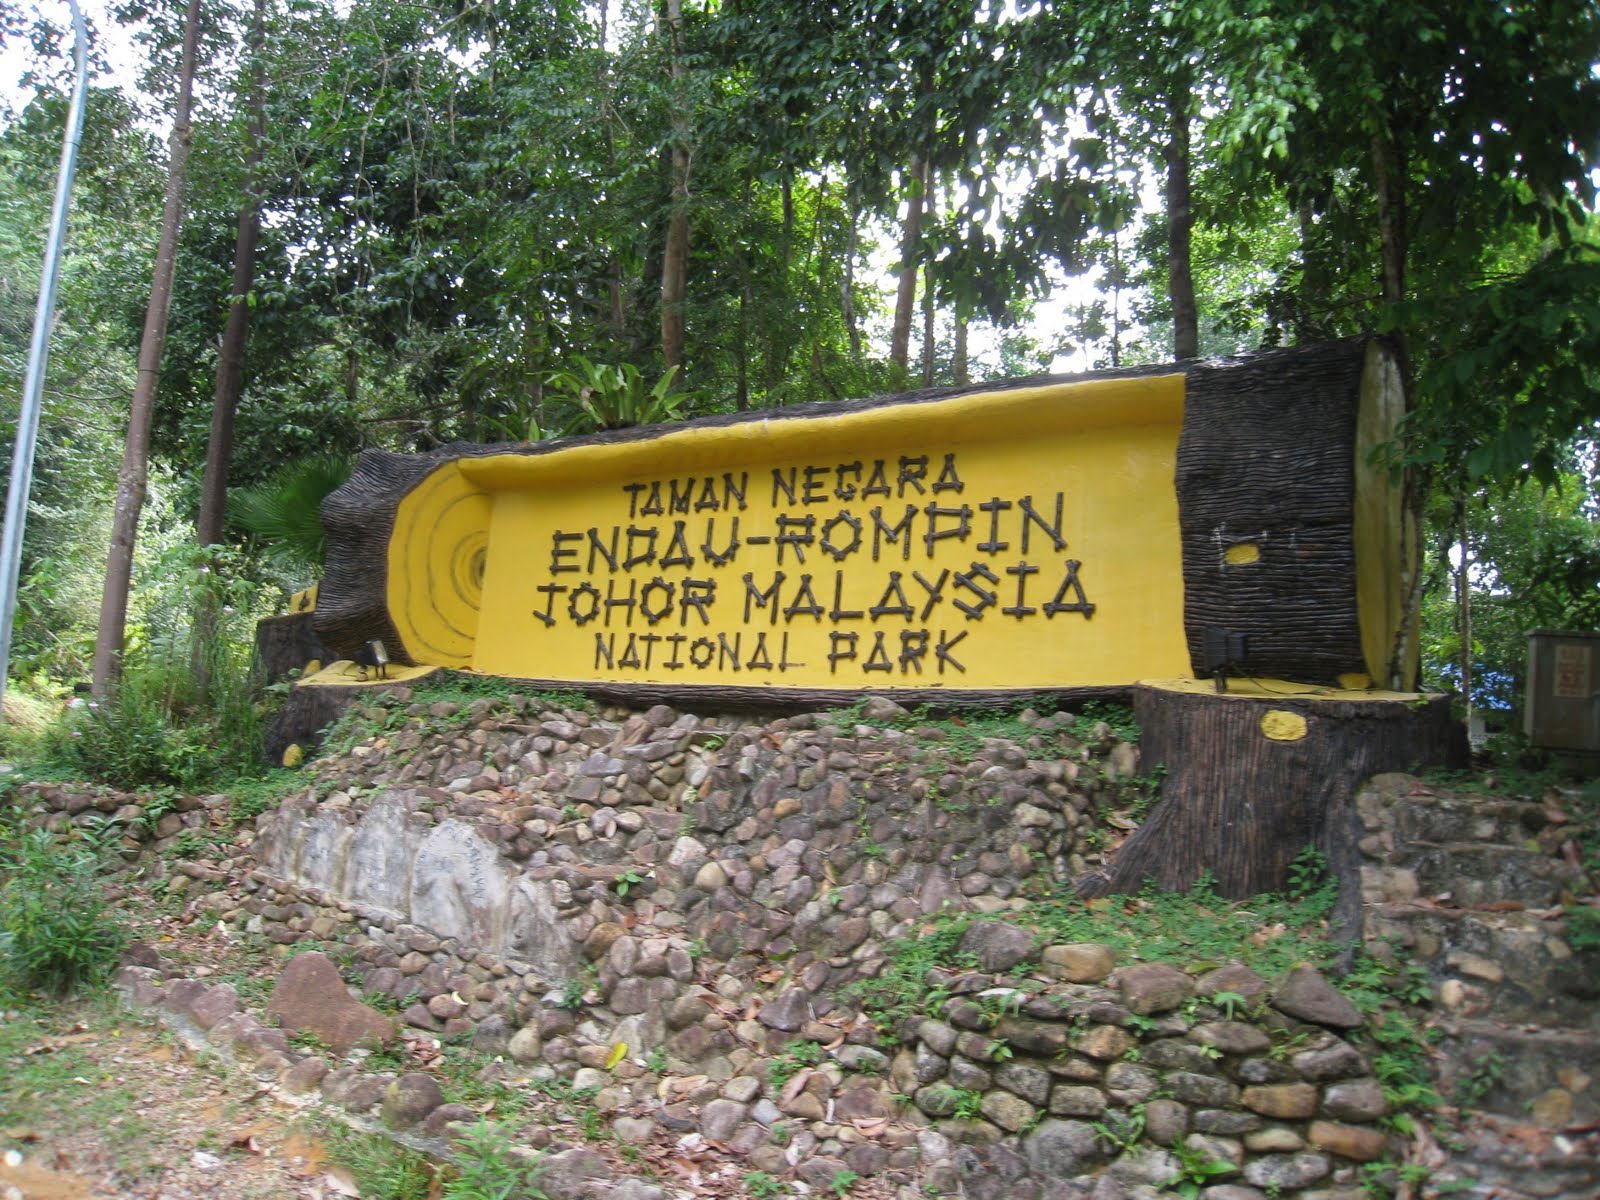 Indau Rombin National Park Malaysia